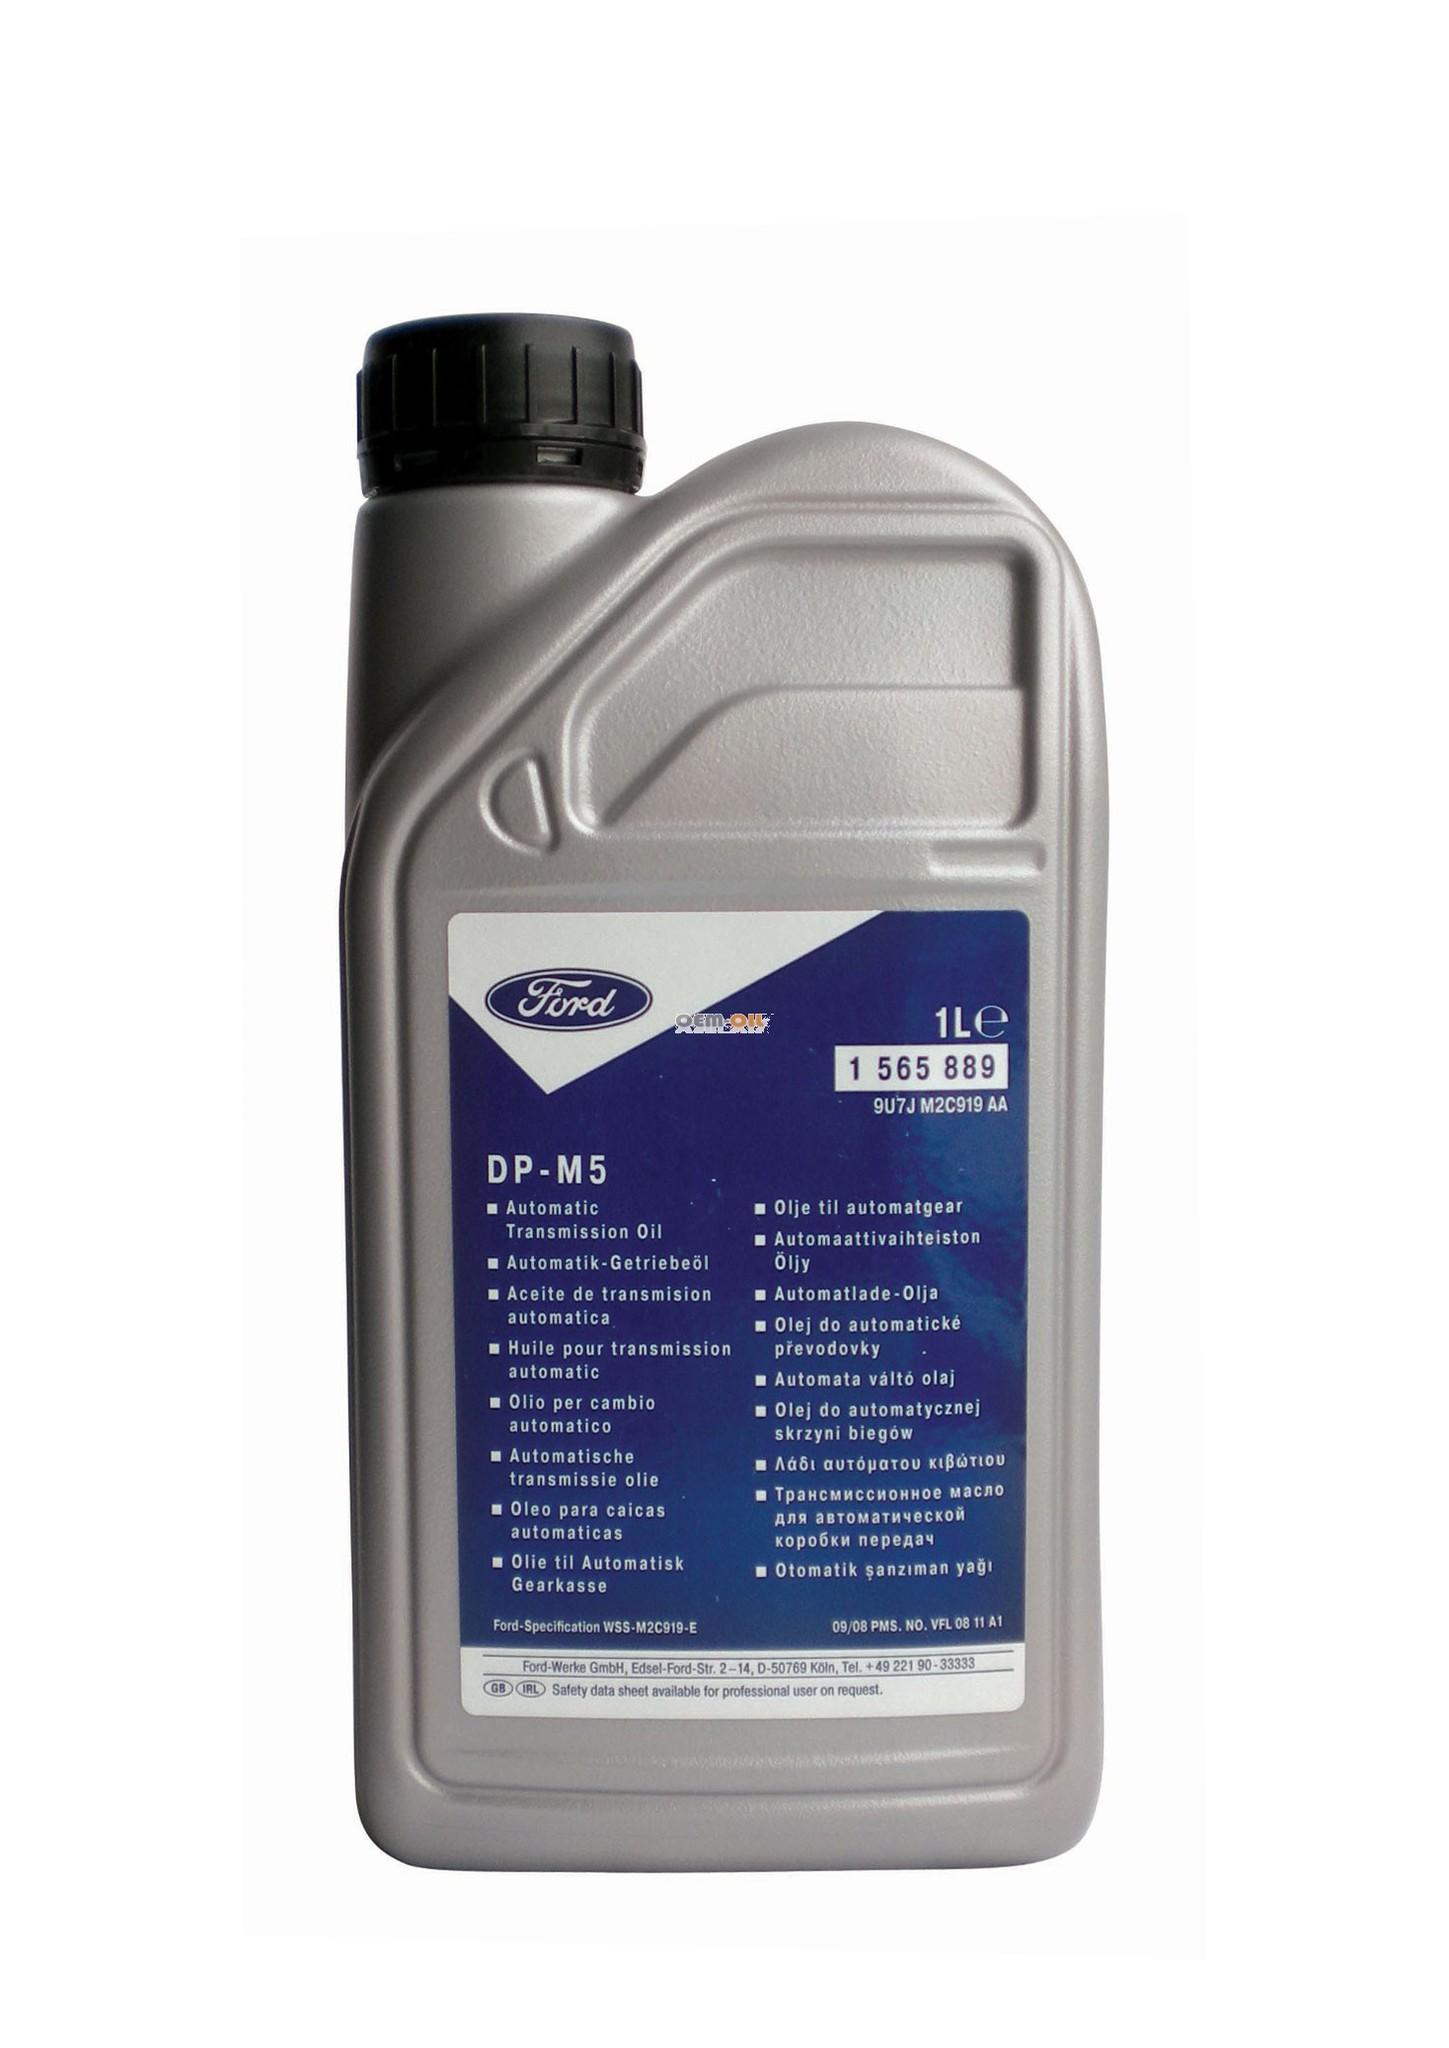 FORD AutoMatic Transmission Oil DP-M5 - Трансмиссионное масло для АКПП и ГУР автомобилей Ford